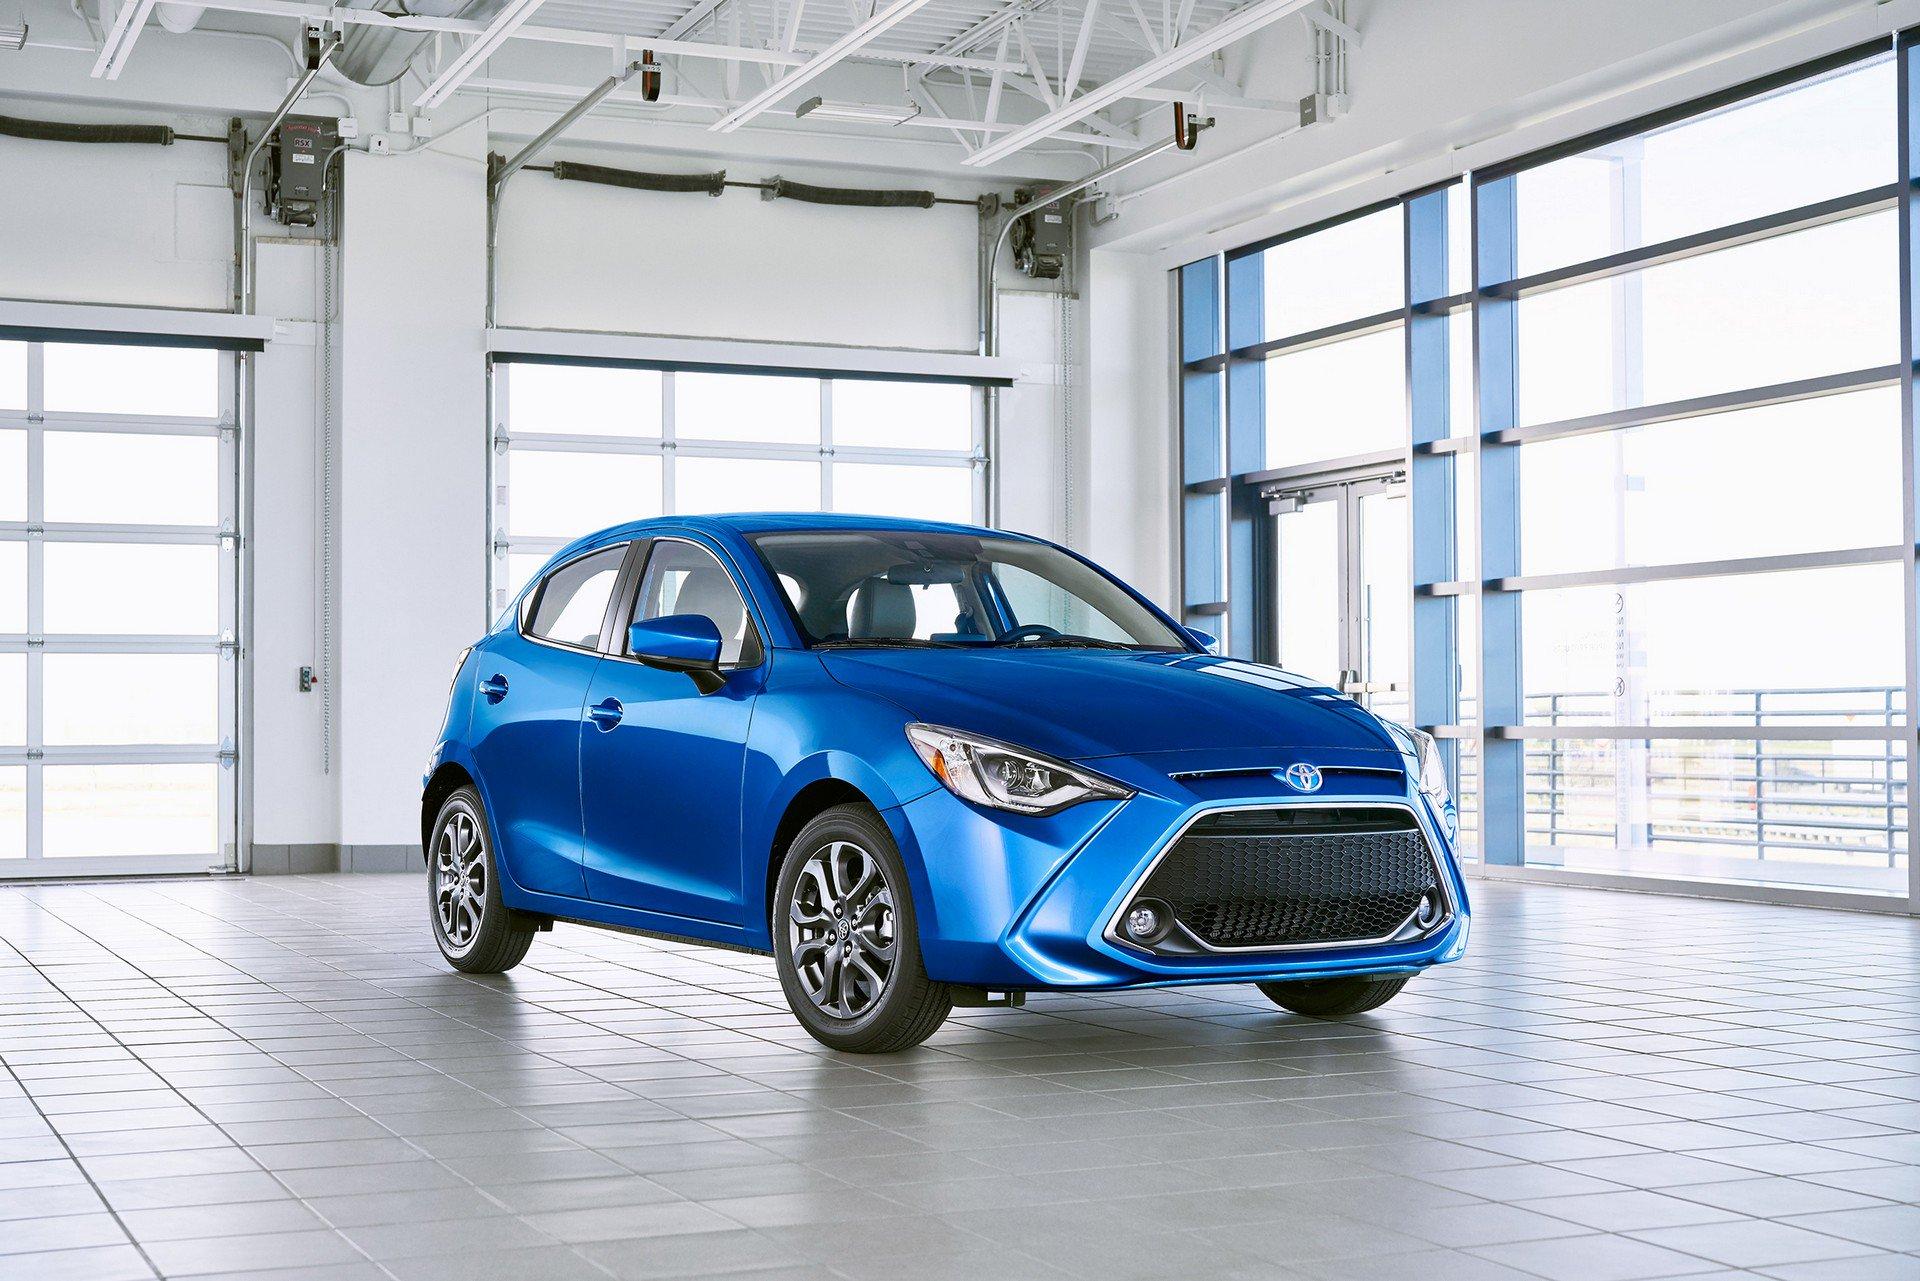 Toyota-Yaris-Hatchback-2020-1